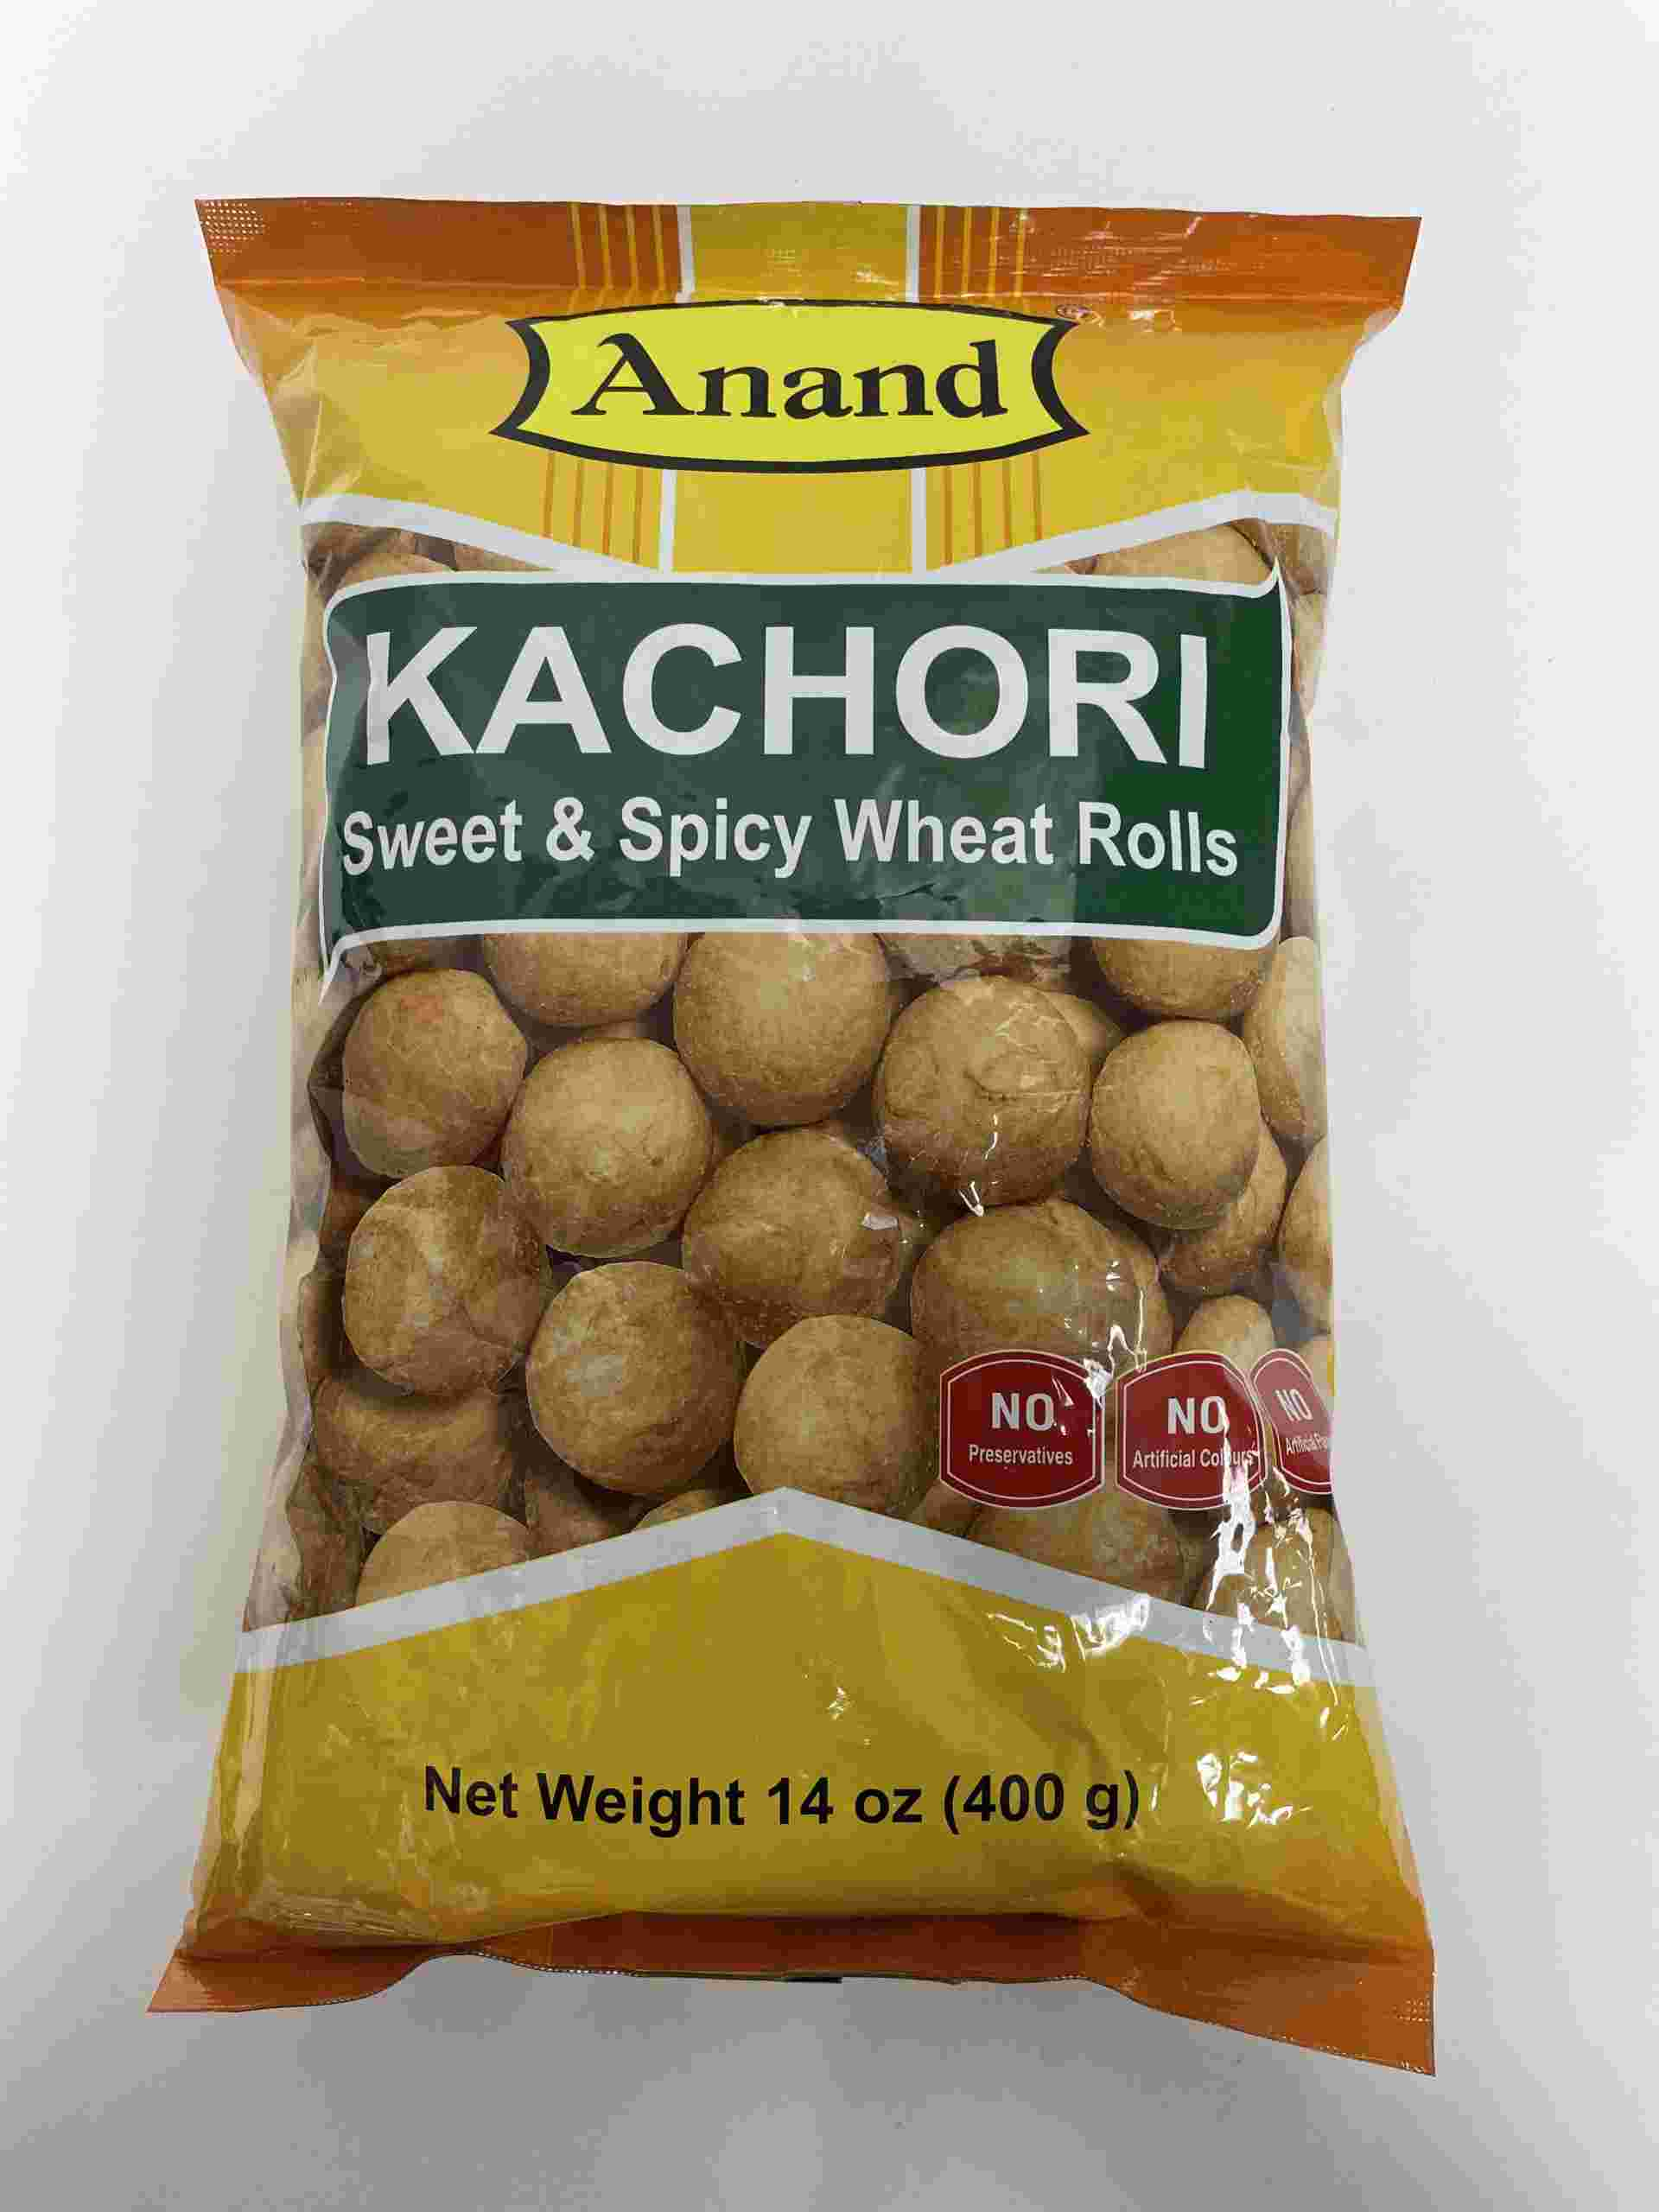 Anand Kachori (Sweet & Spicy Wheat Rolls)